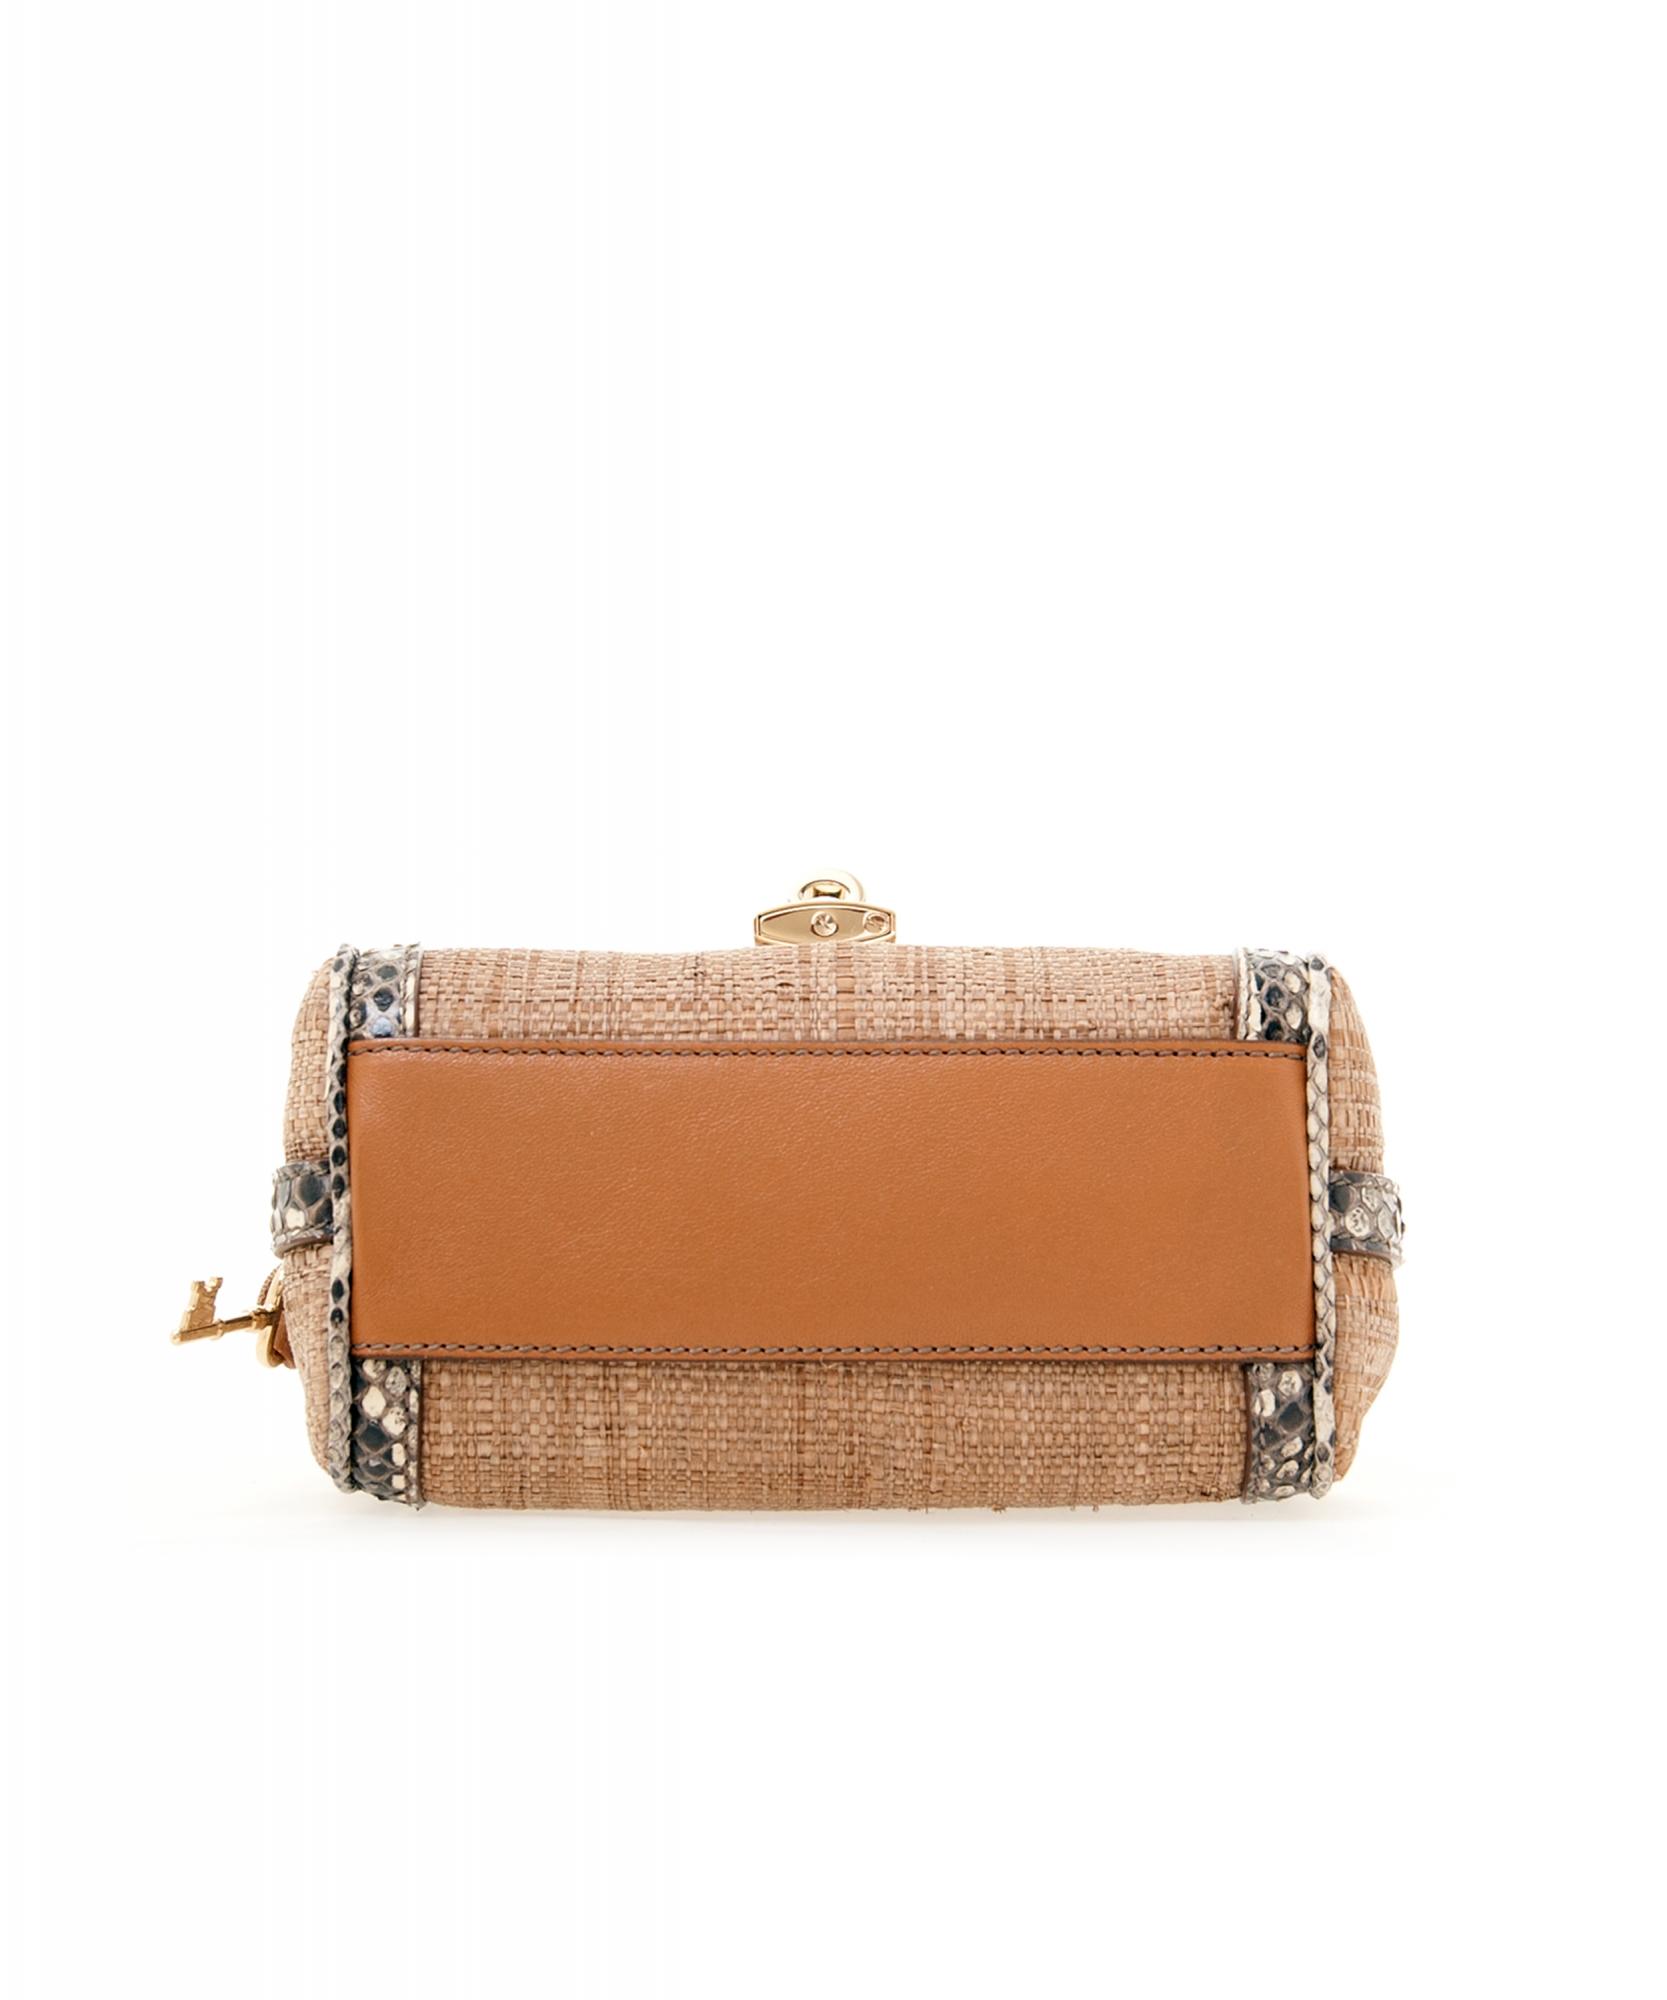 ... Gabbana Raffia Miss Dolce Bag. Tap to expand 42785401ec3f5